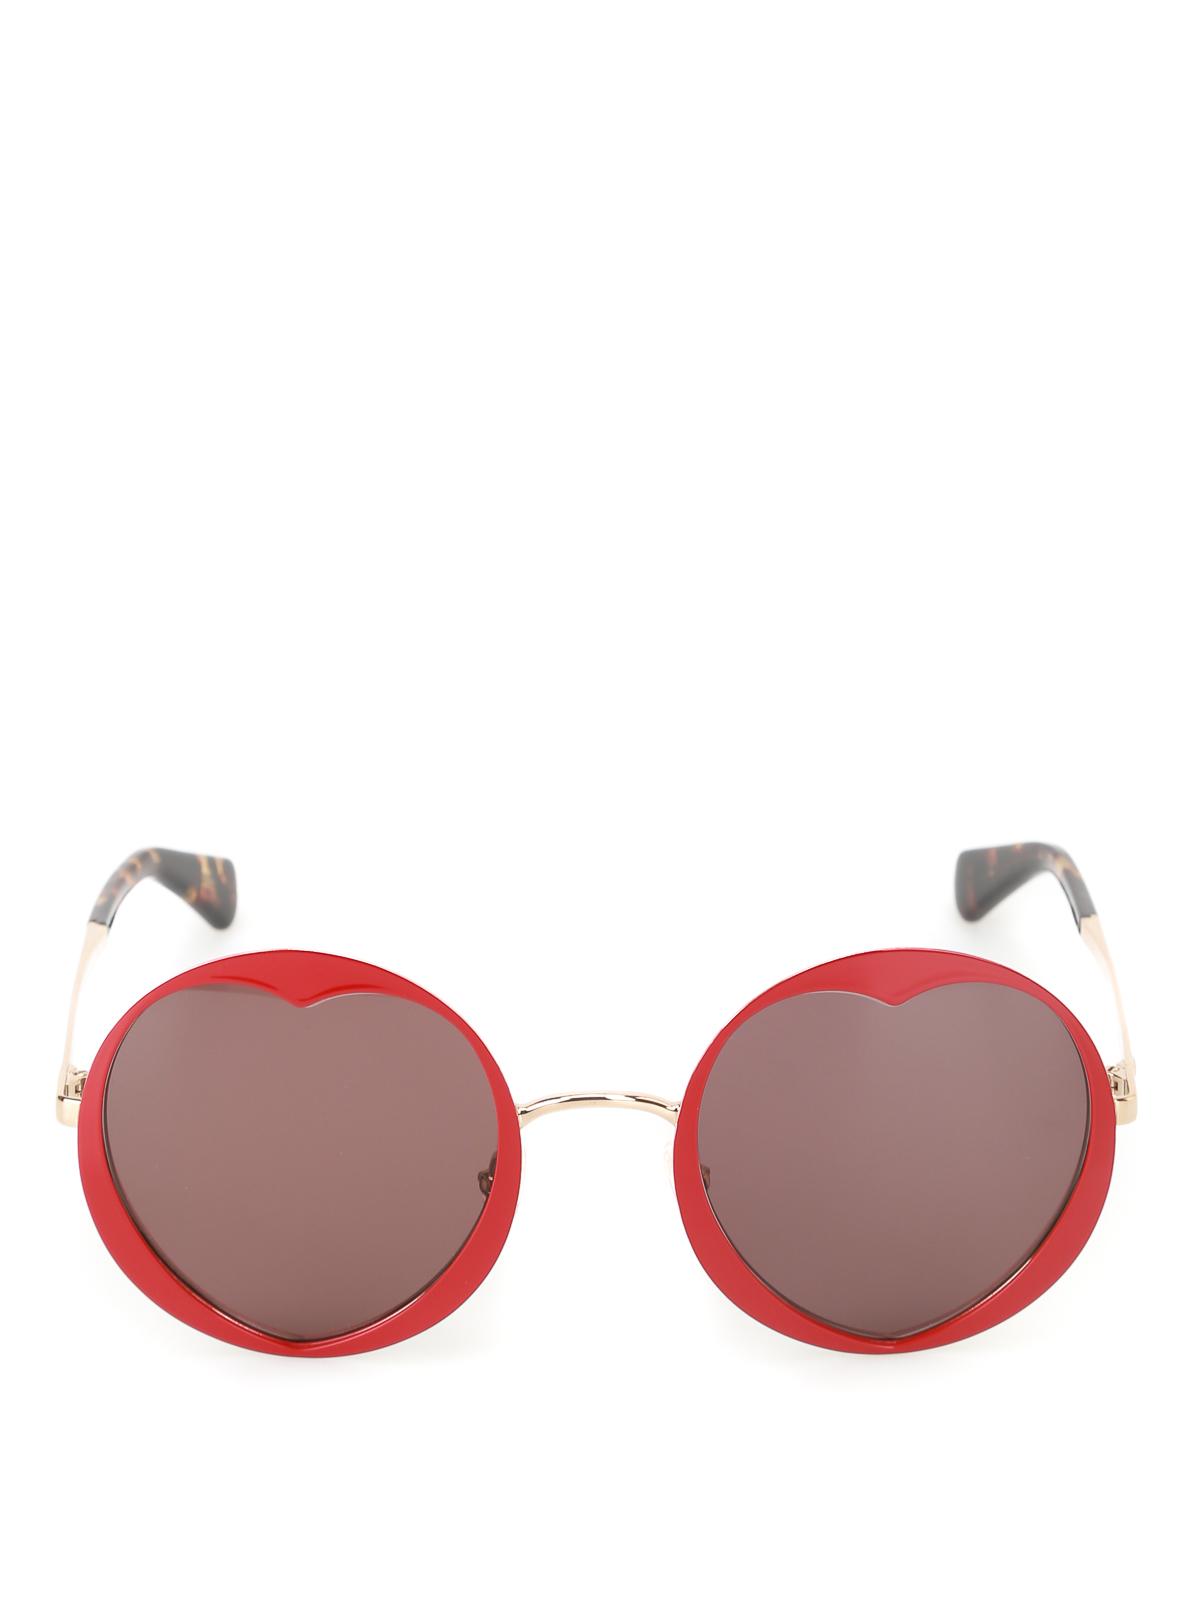 bfd4bb2f2fc6 iKRIX KATE SPADE: sunglasses - Rosaria heart-shaped red sunglasses